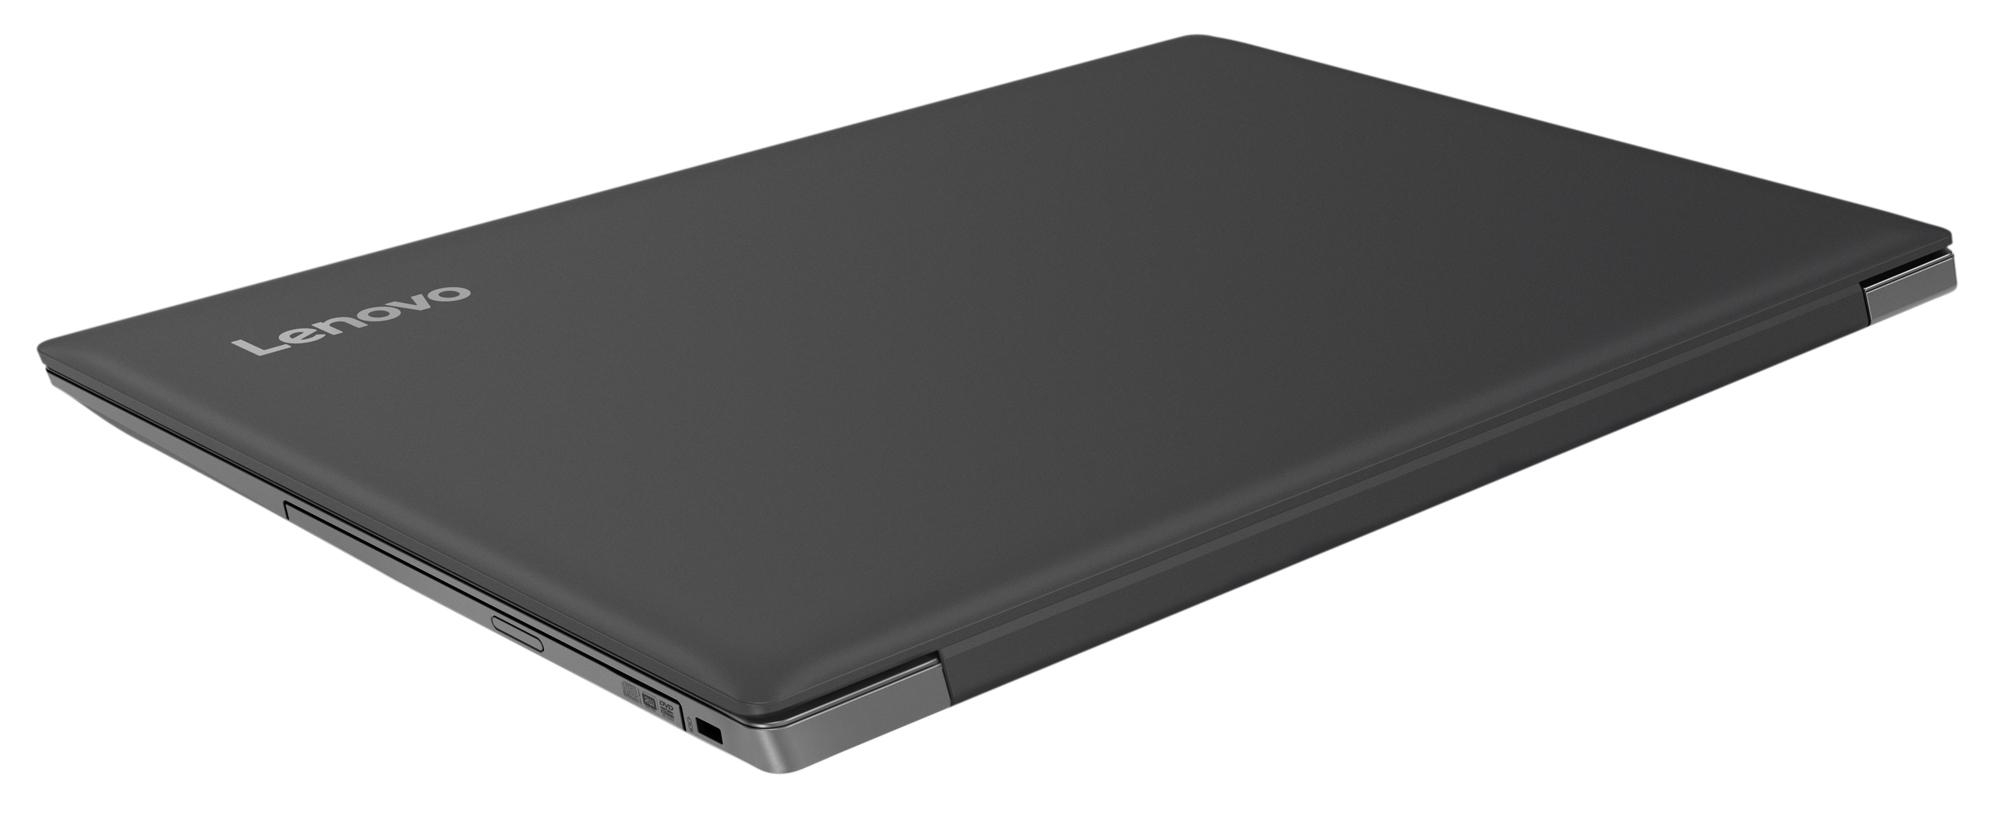 Фото  Ноутбук Lenovo ideapad 330-15 Onyx Black (81DE01FMRA)